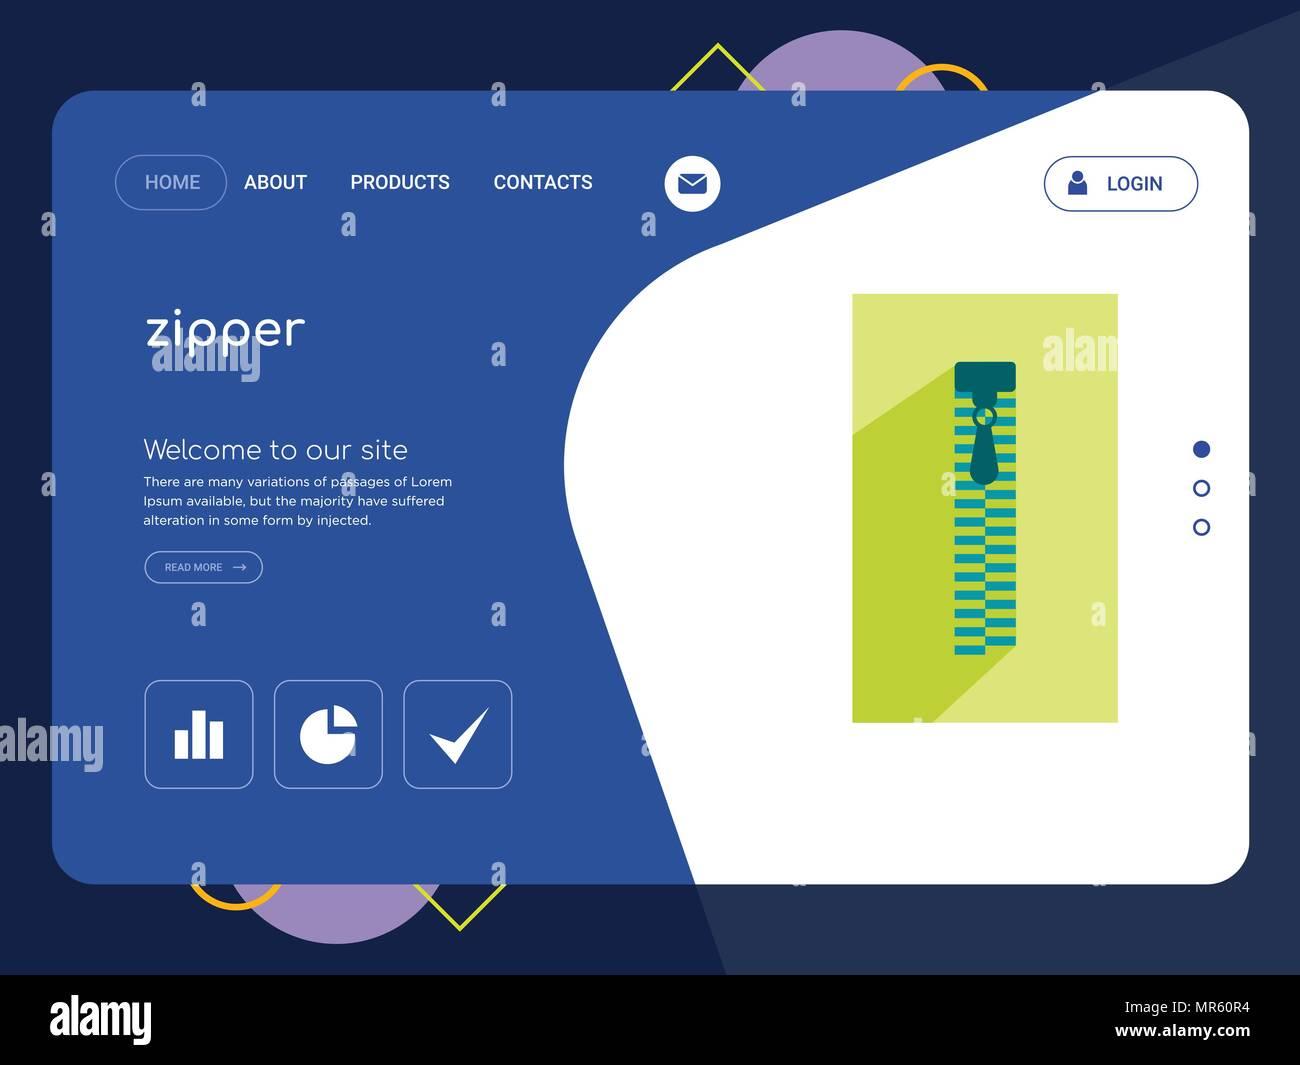 zipper illustration zip silhouette stock photos zipper